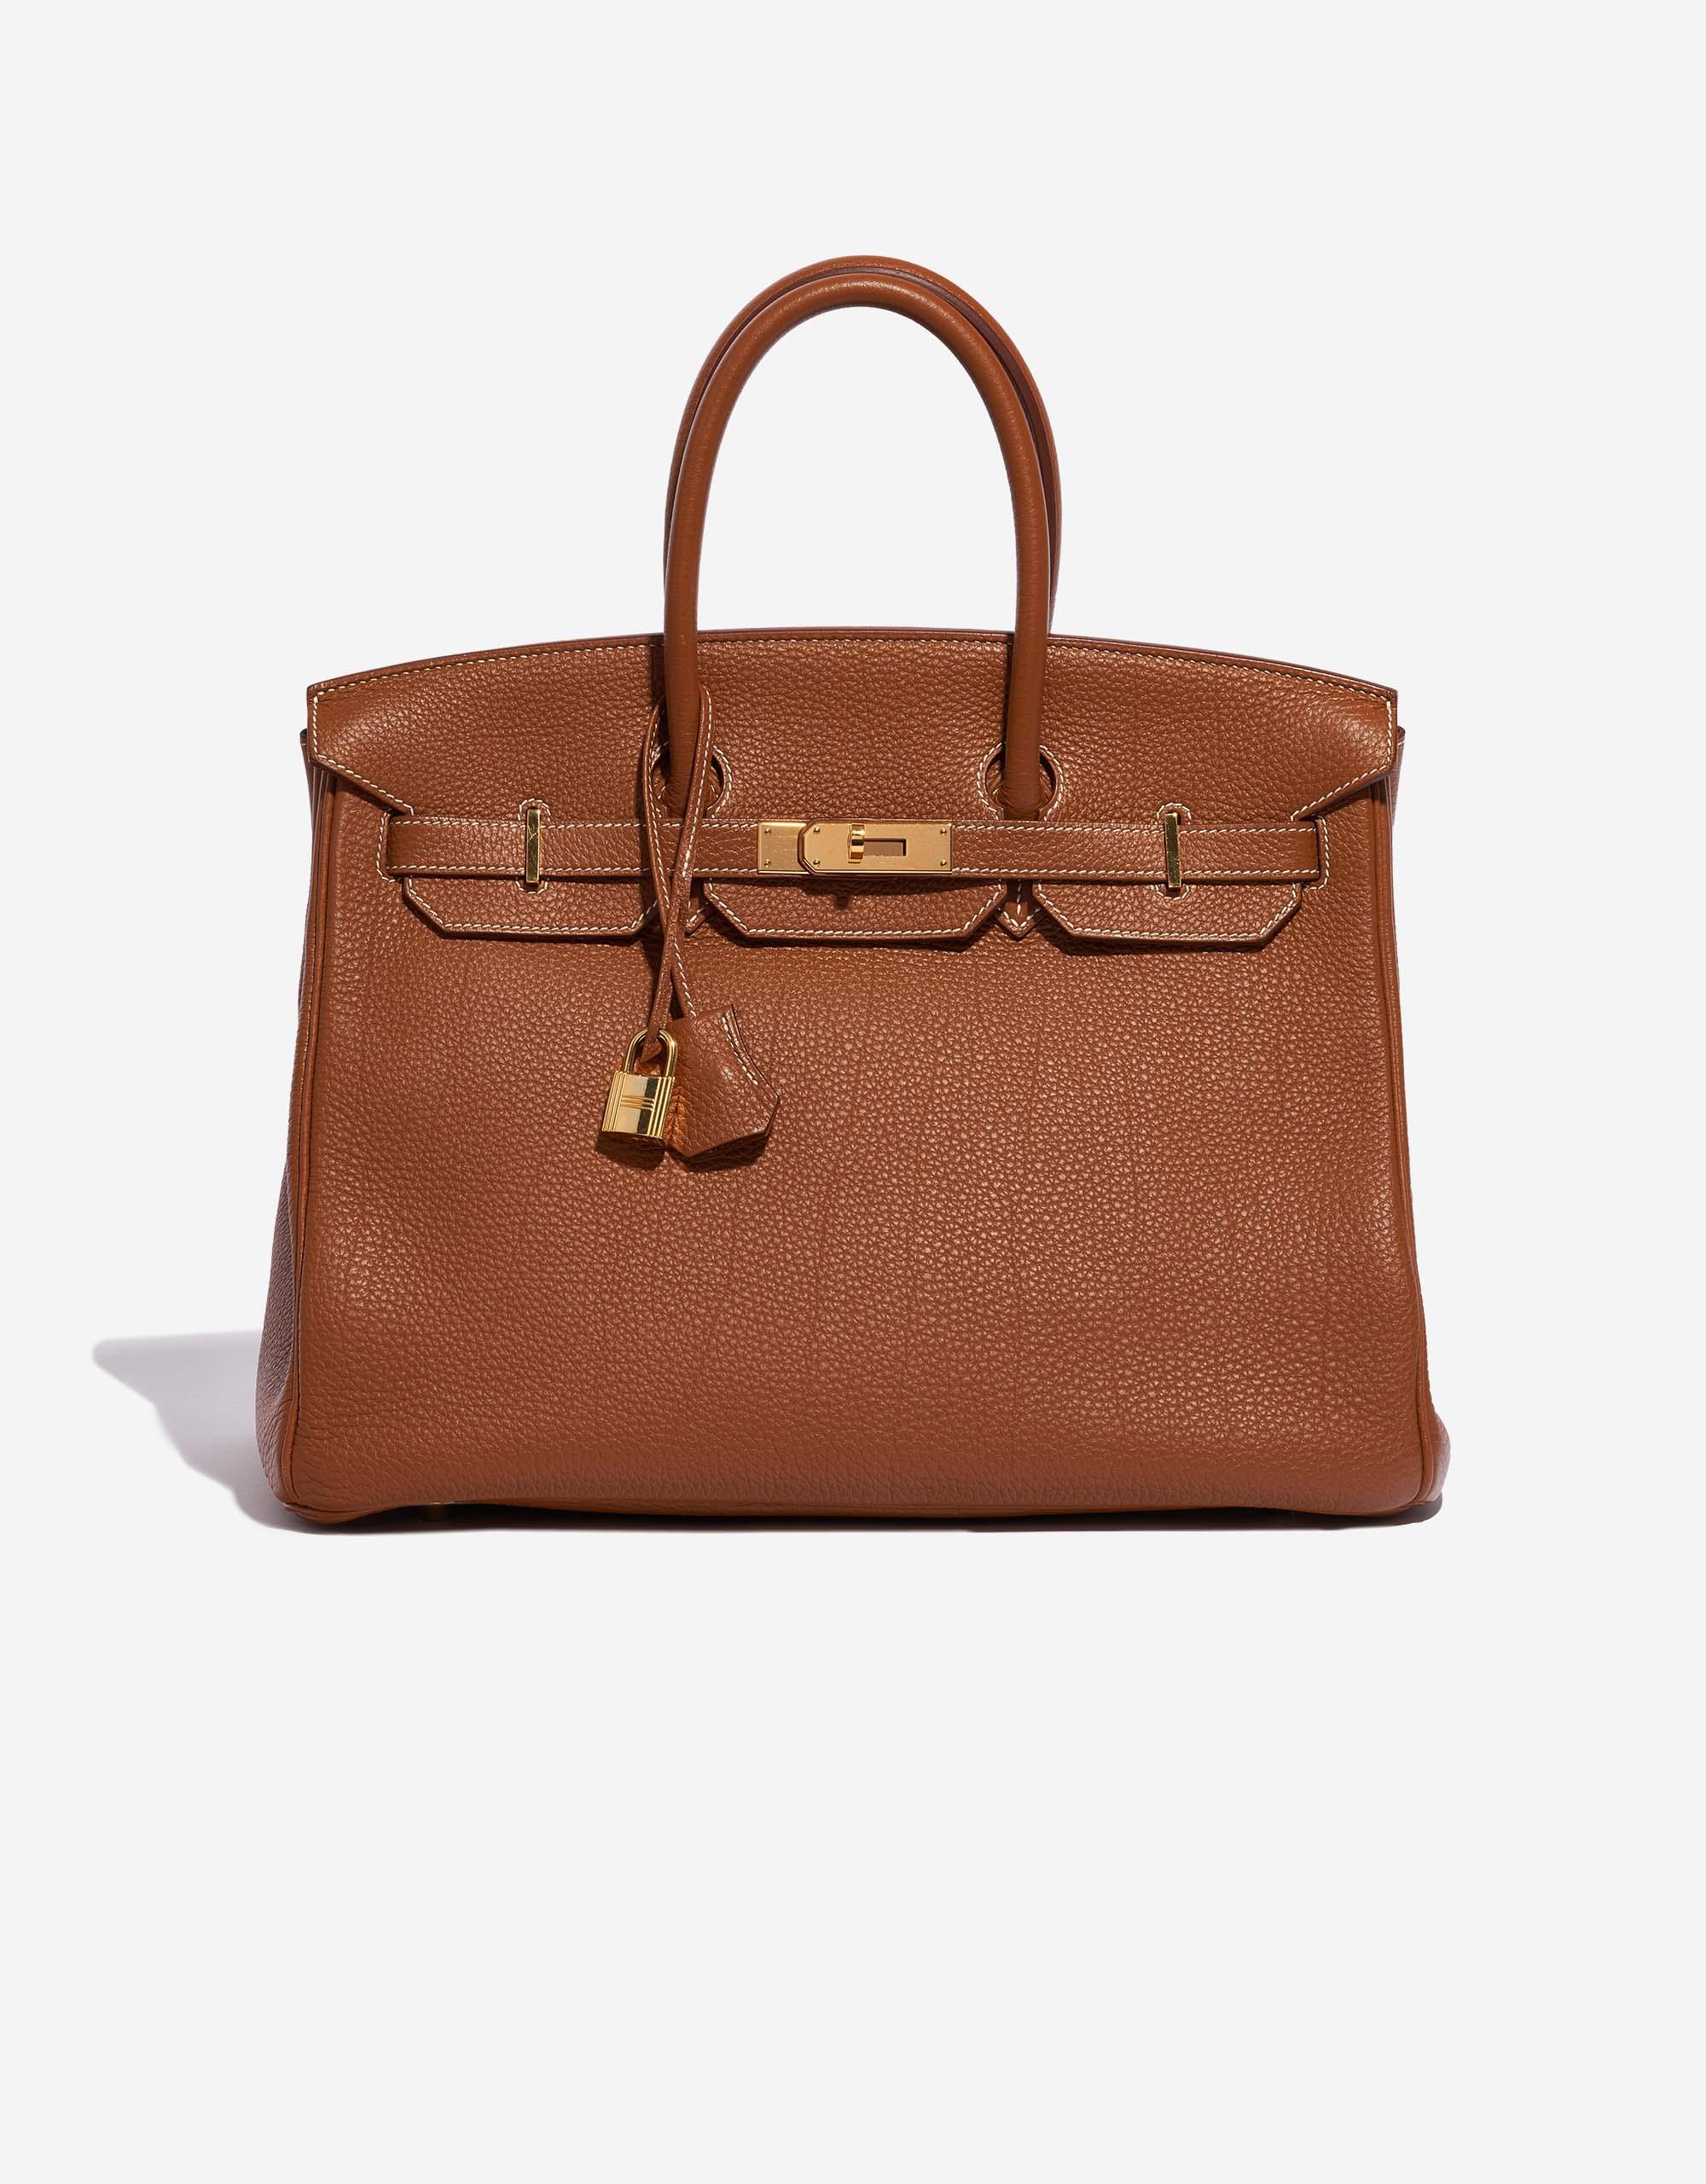 Hermès Birkin 35 Togo Gold | SACLÀB